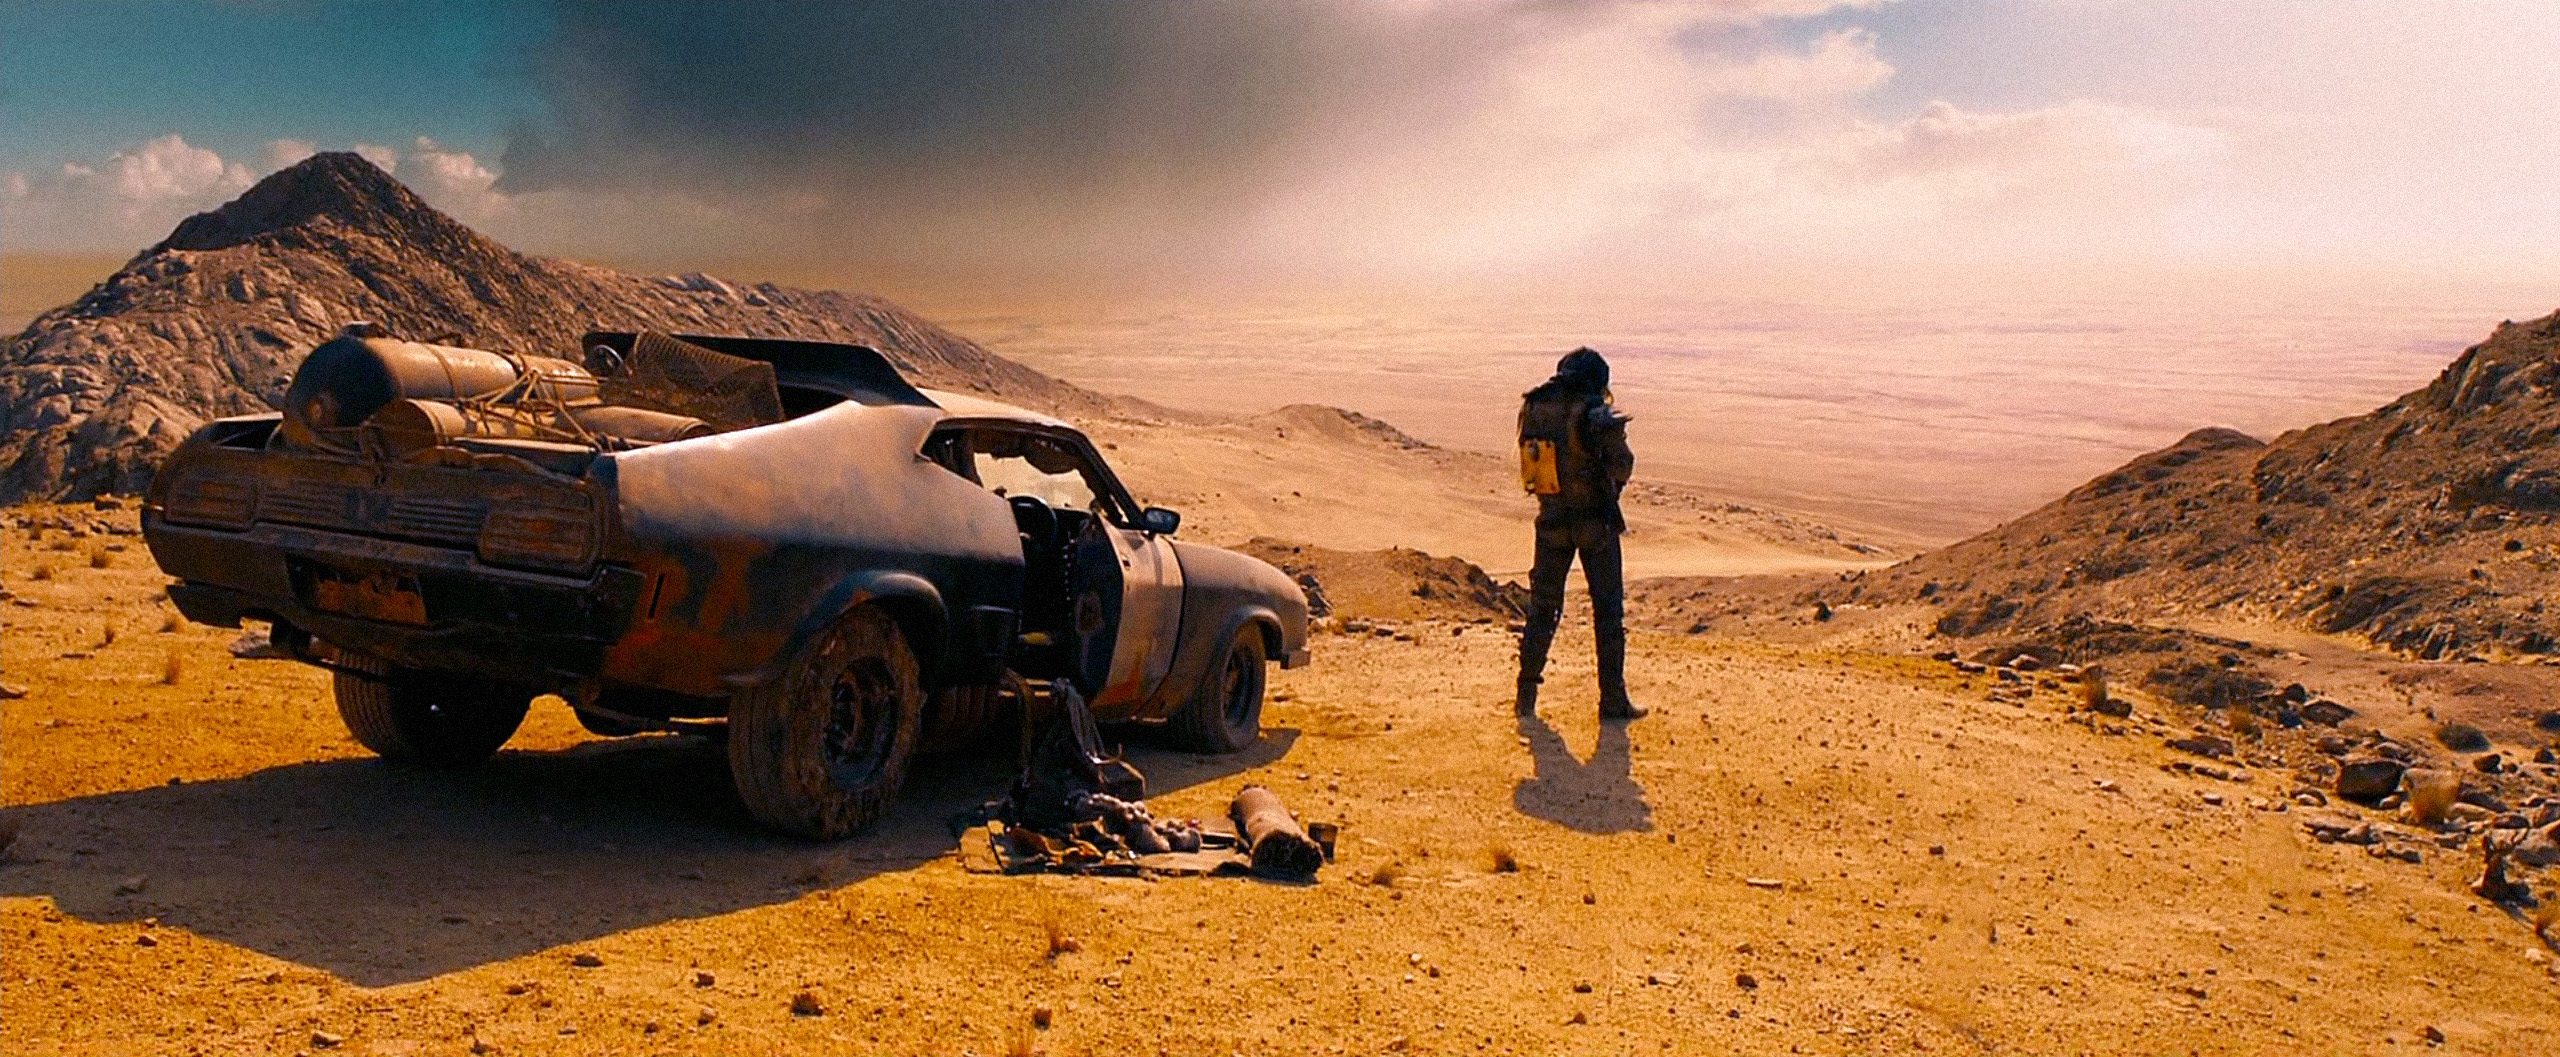 Mad Max – Fury Road, una furia smisurata